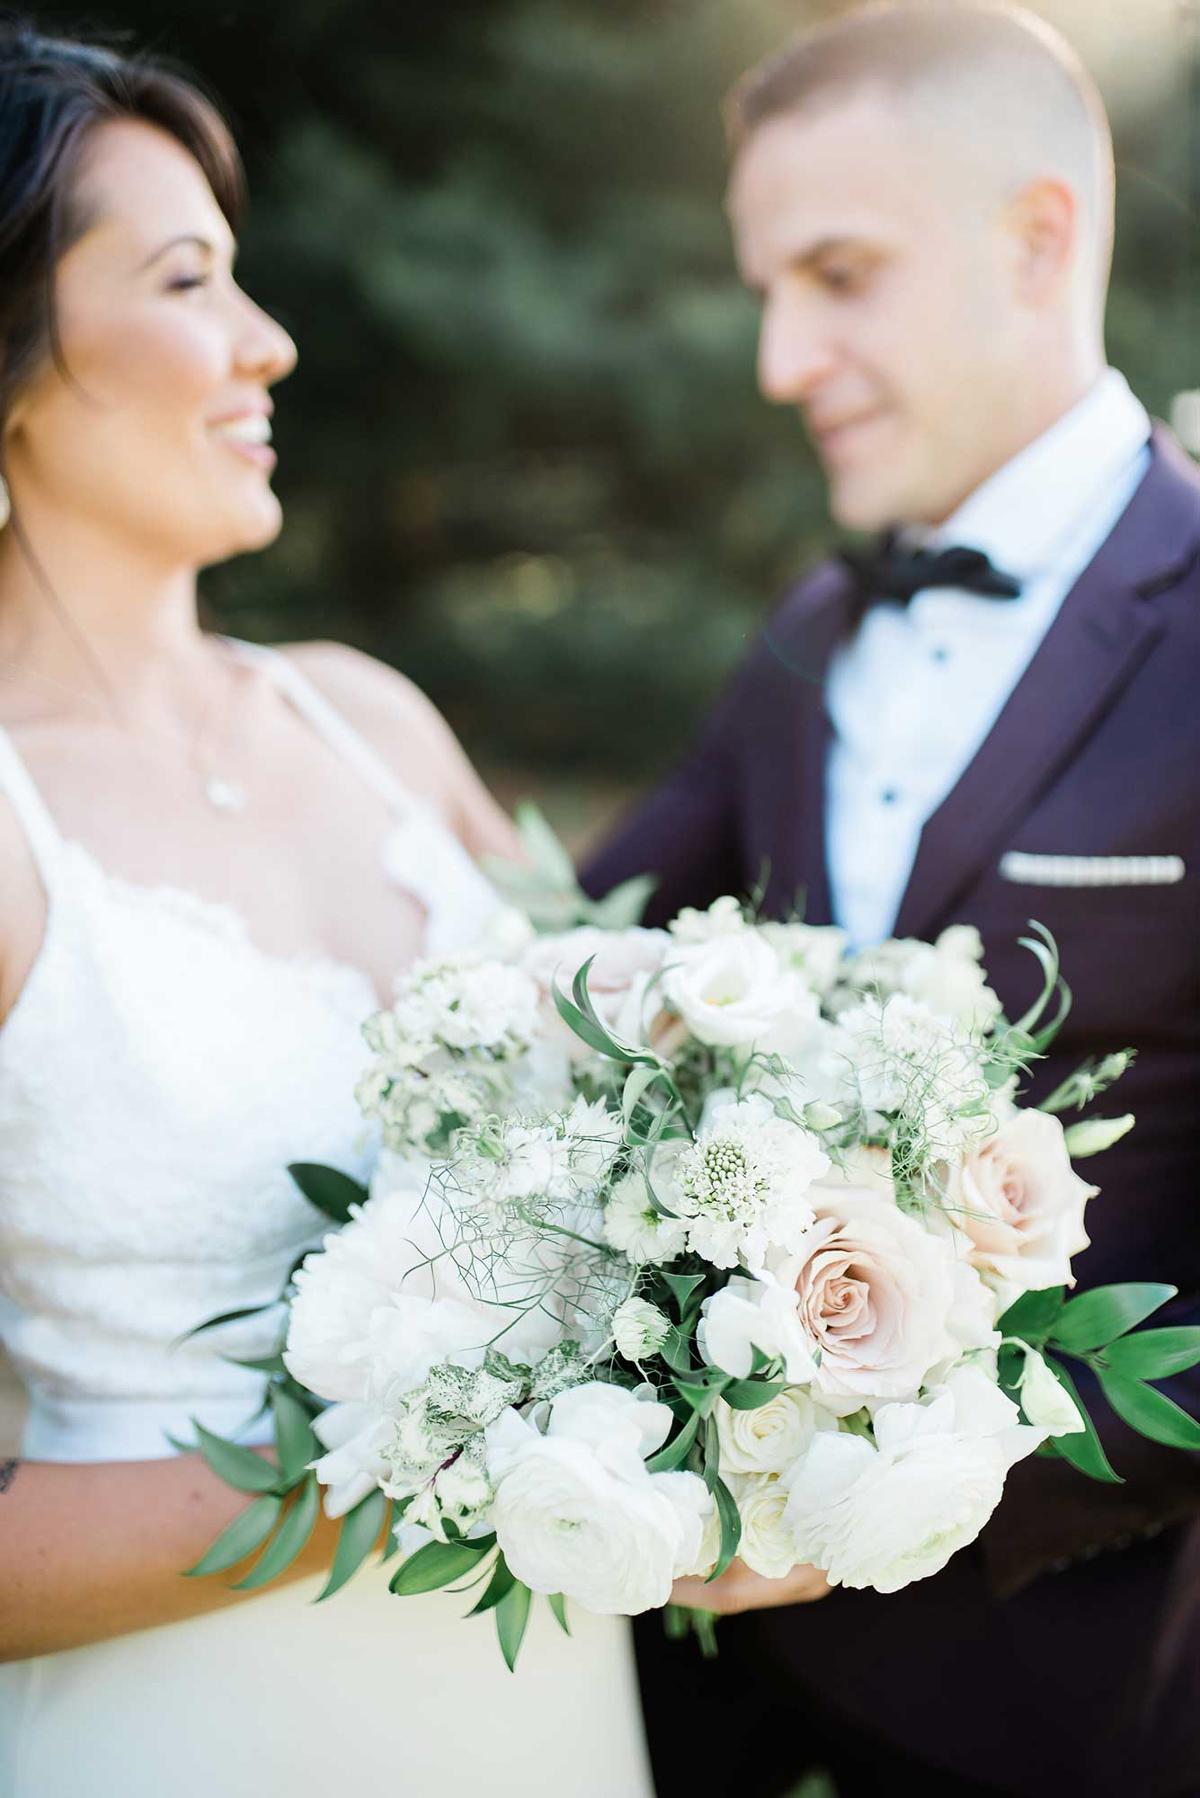 destiny-dawn-photography-vineyard-bride-swish-list-knollwood-golf-and-country-club-ancaster-wedding-editorial-19.jpg